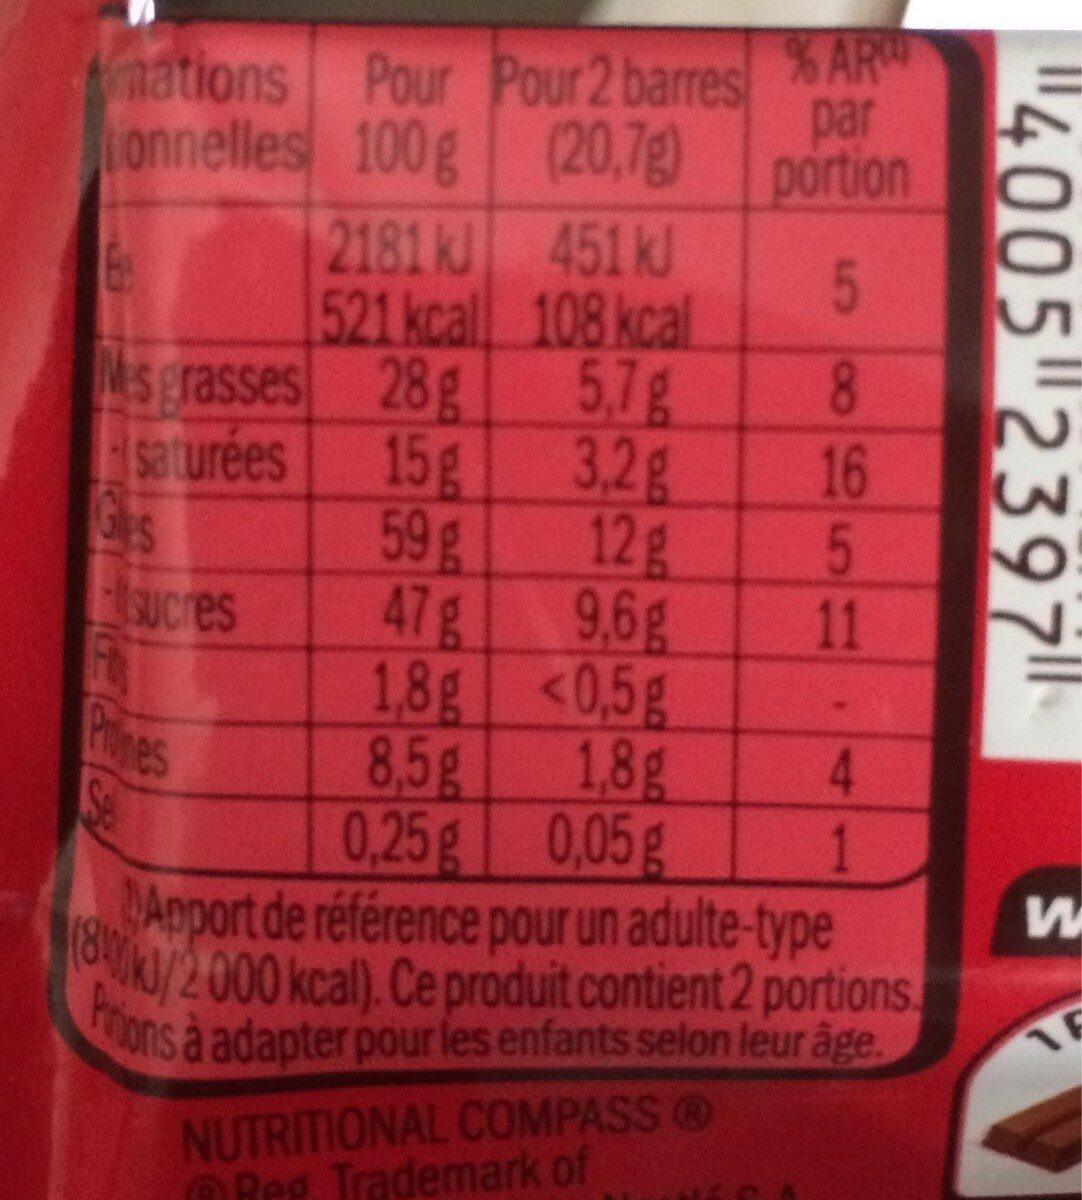 KITKAT barre chocolatée 41,5g - Información nutricional - fr